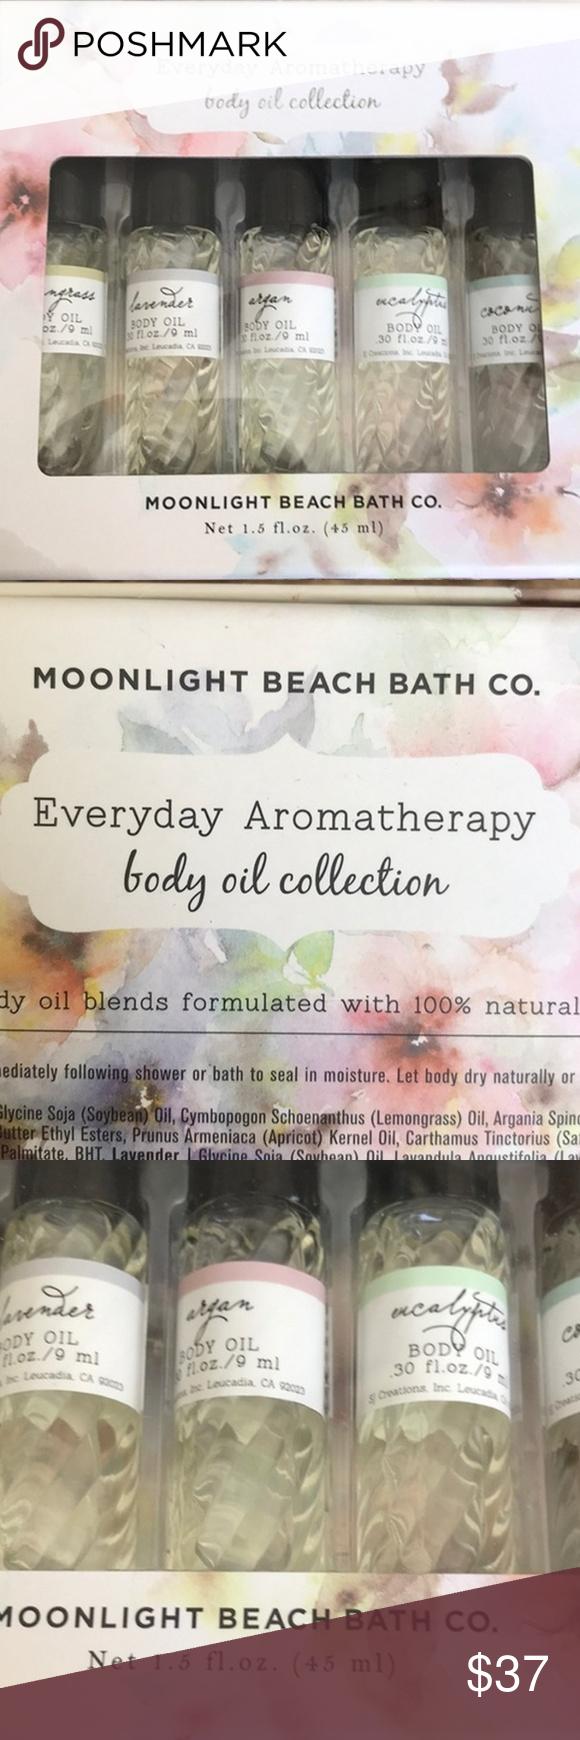 Leucadia Bath Co : leucadia, MOONLIGHT, BEACH, Collection, Aromatherapy